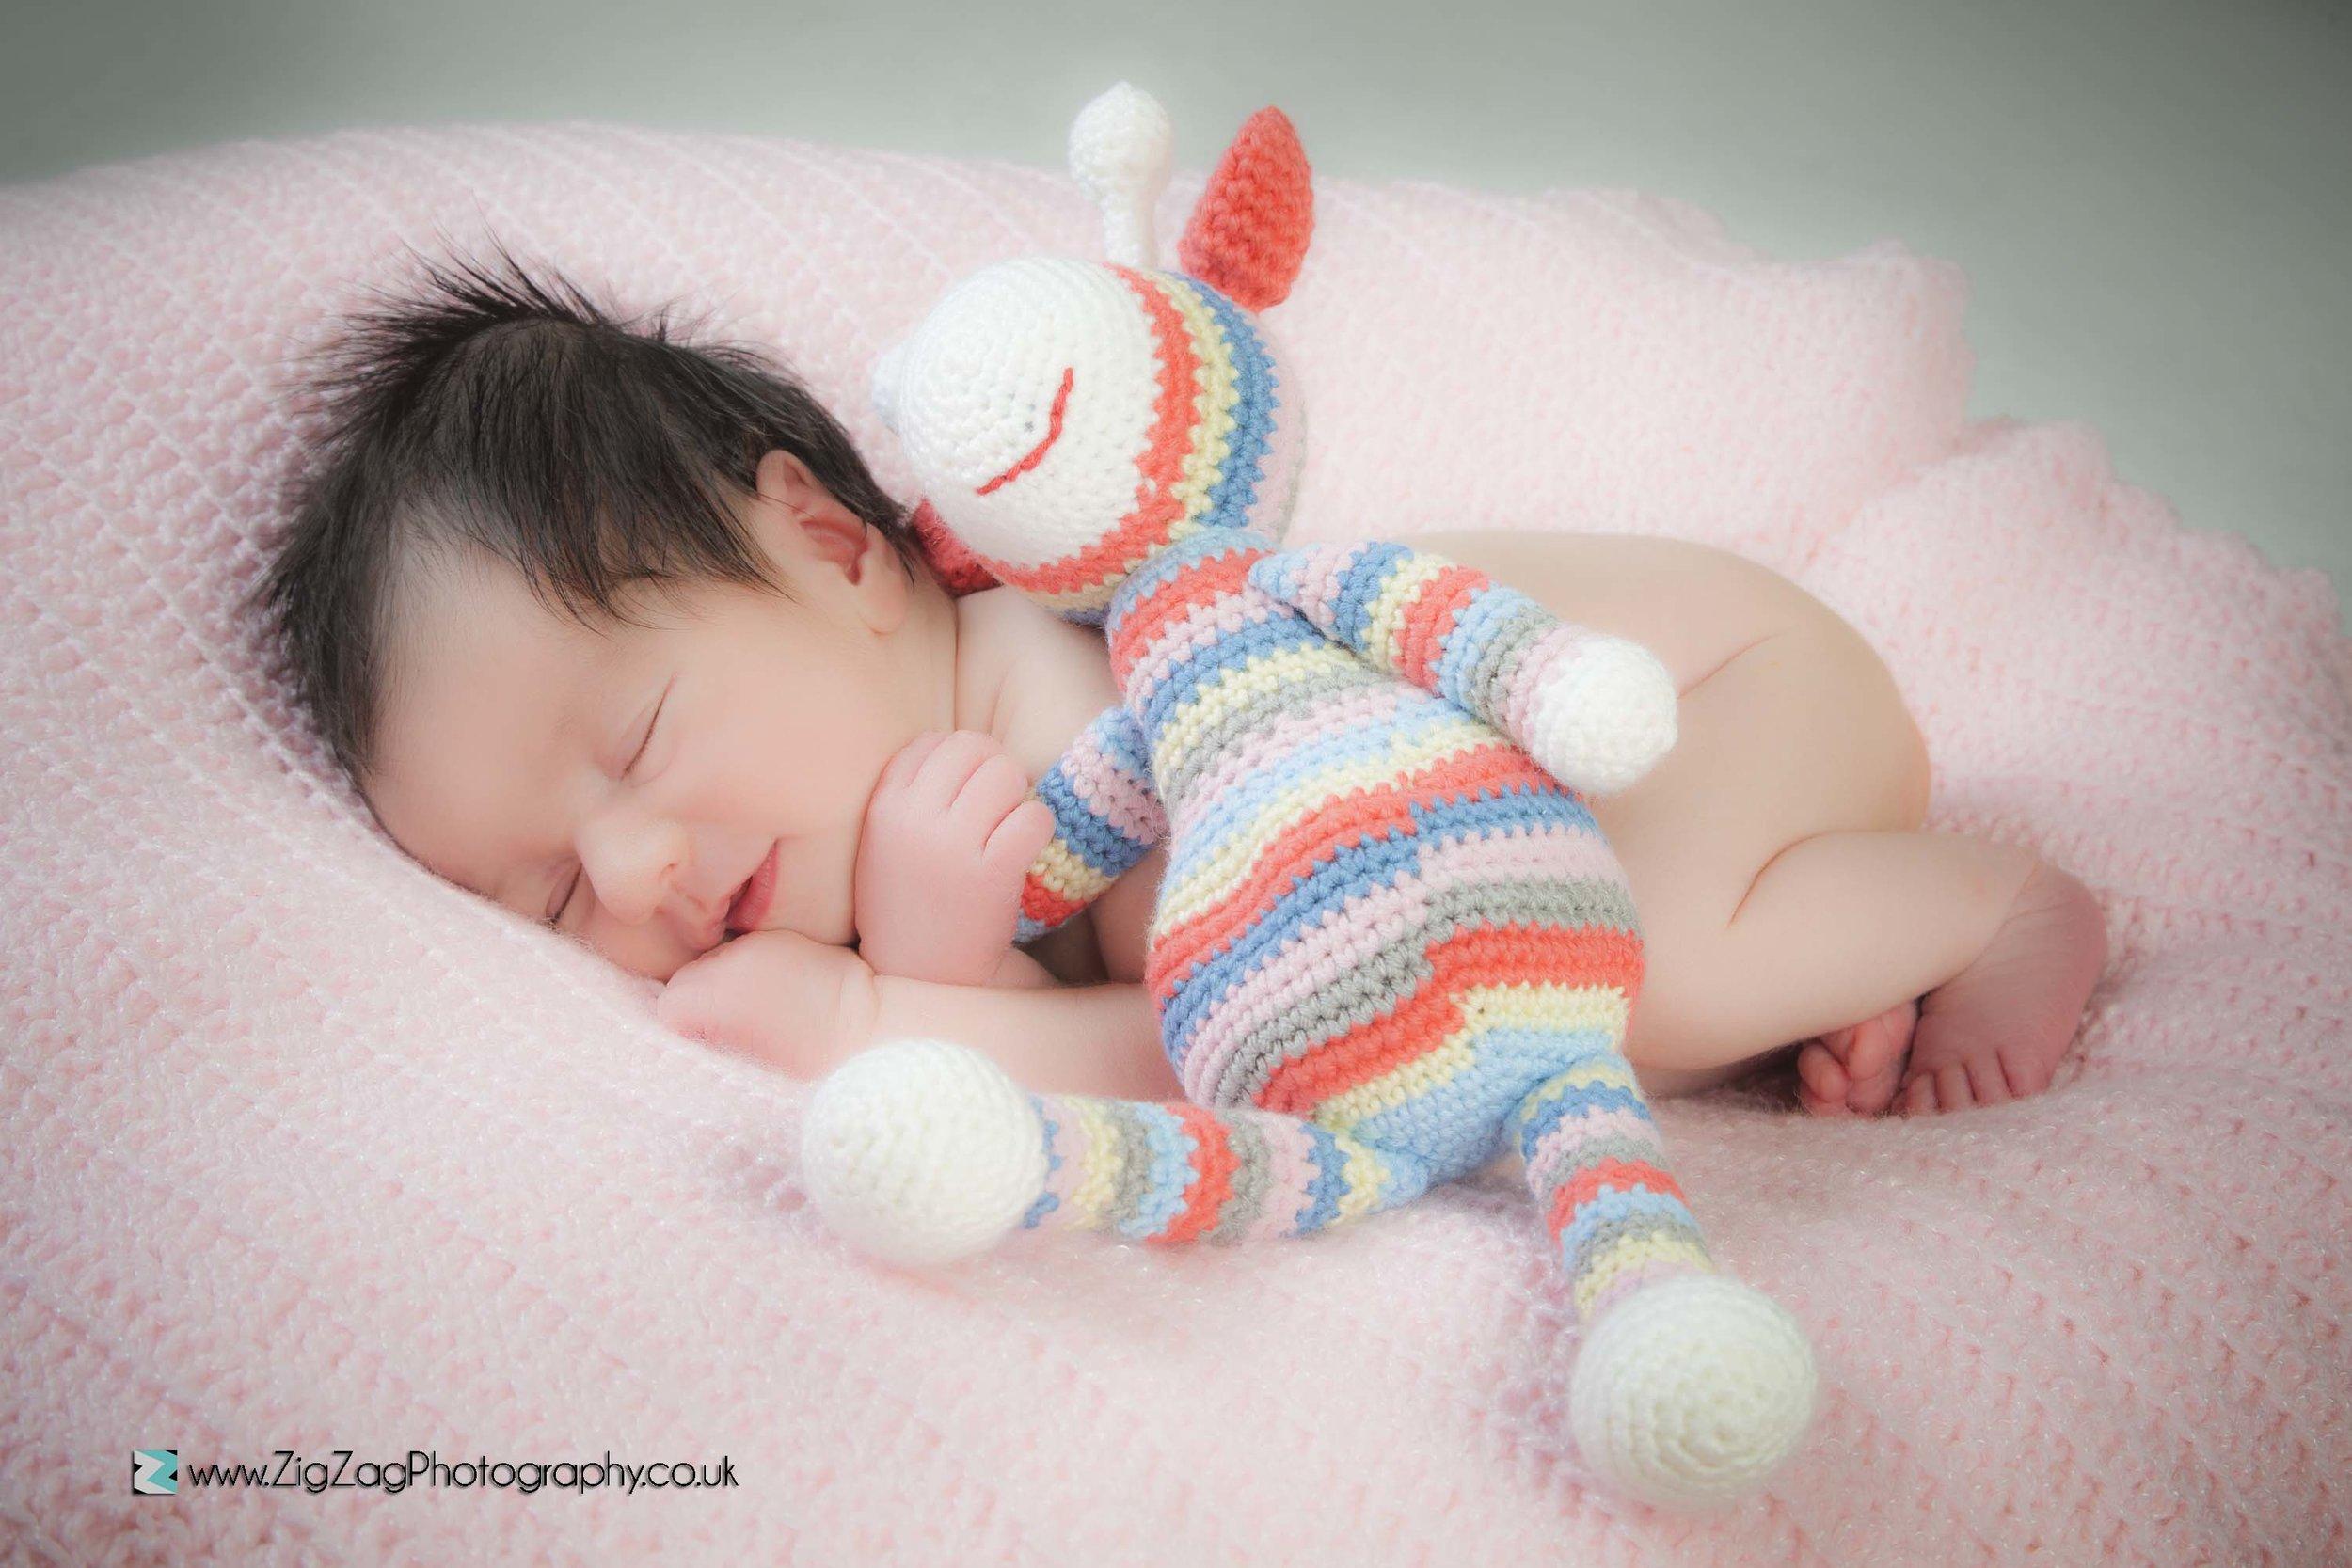 newborn-photography-photoshoot-leicester-studio-props-sleeping-blanket-baby-ideas.jpg